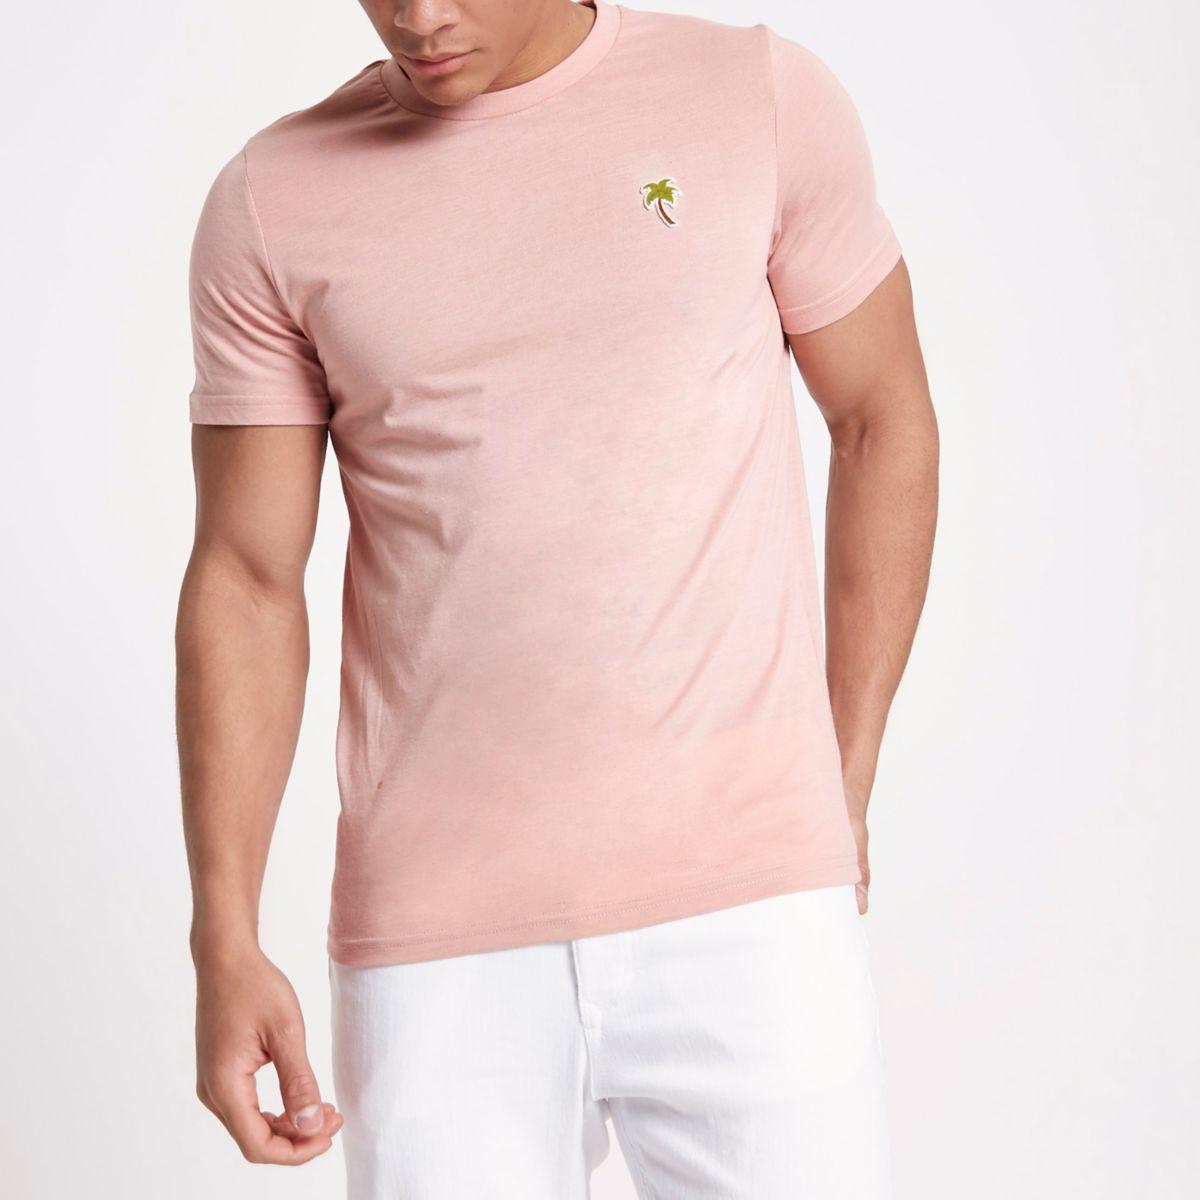 Jack & Jones pink palm embroidered T-shirt